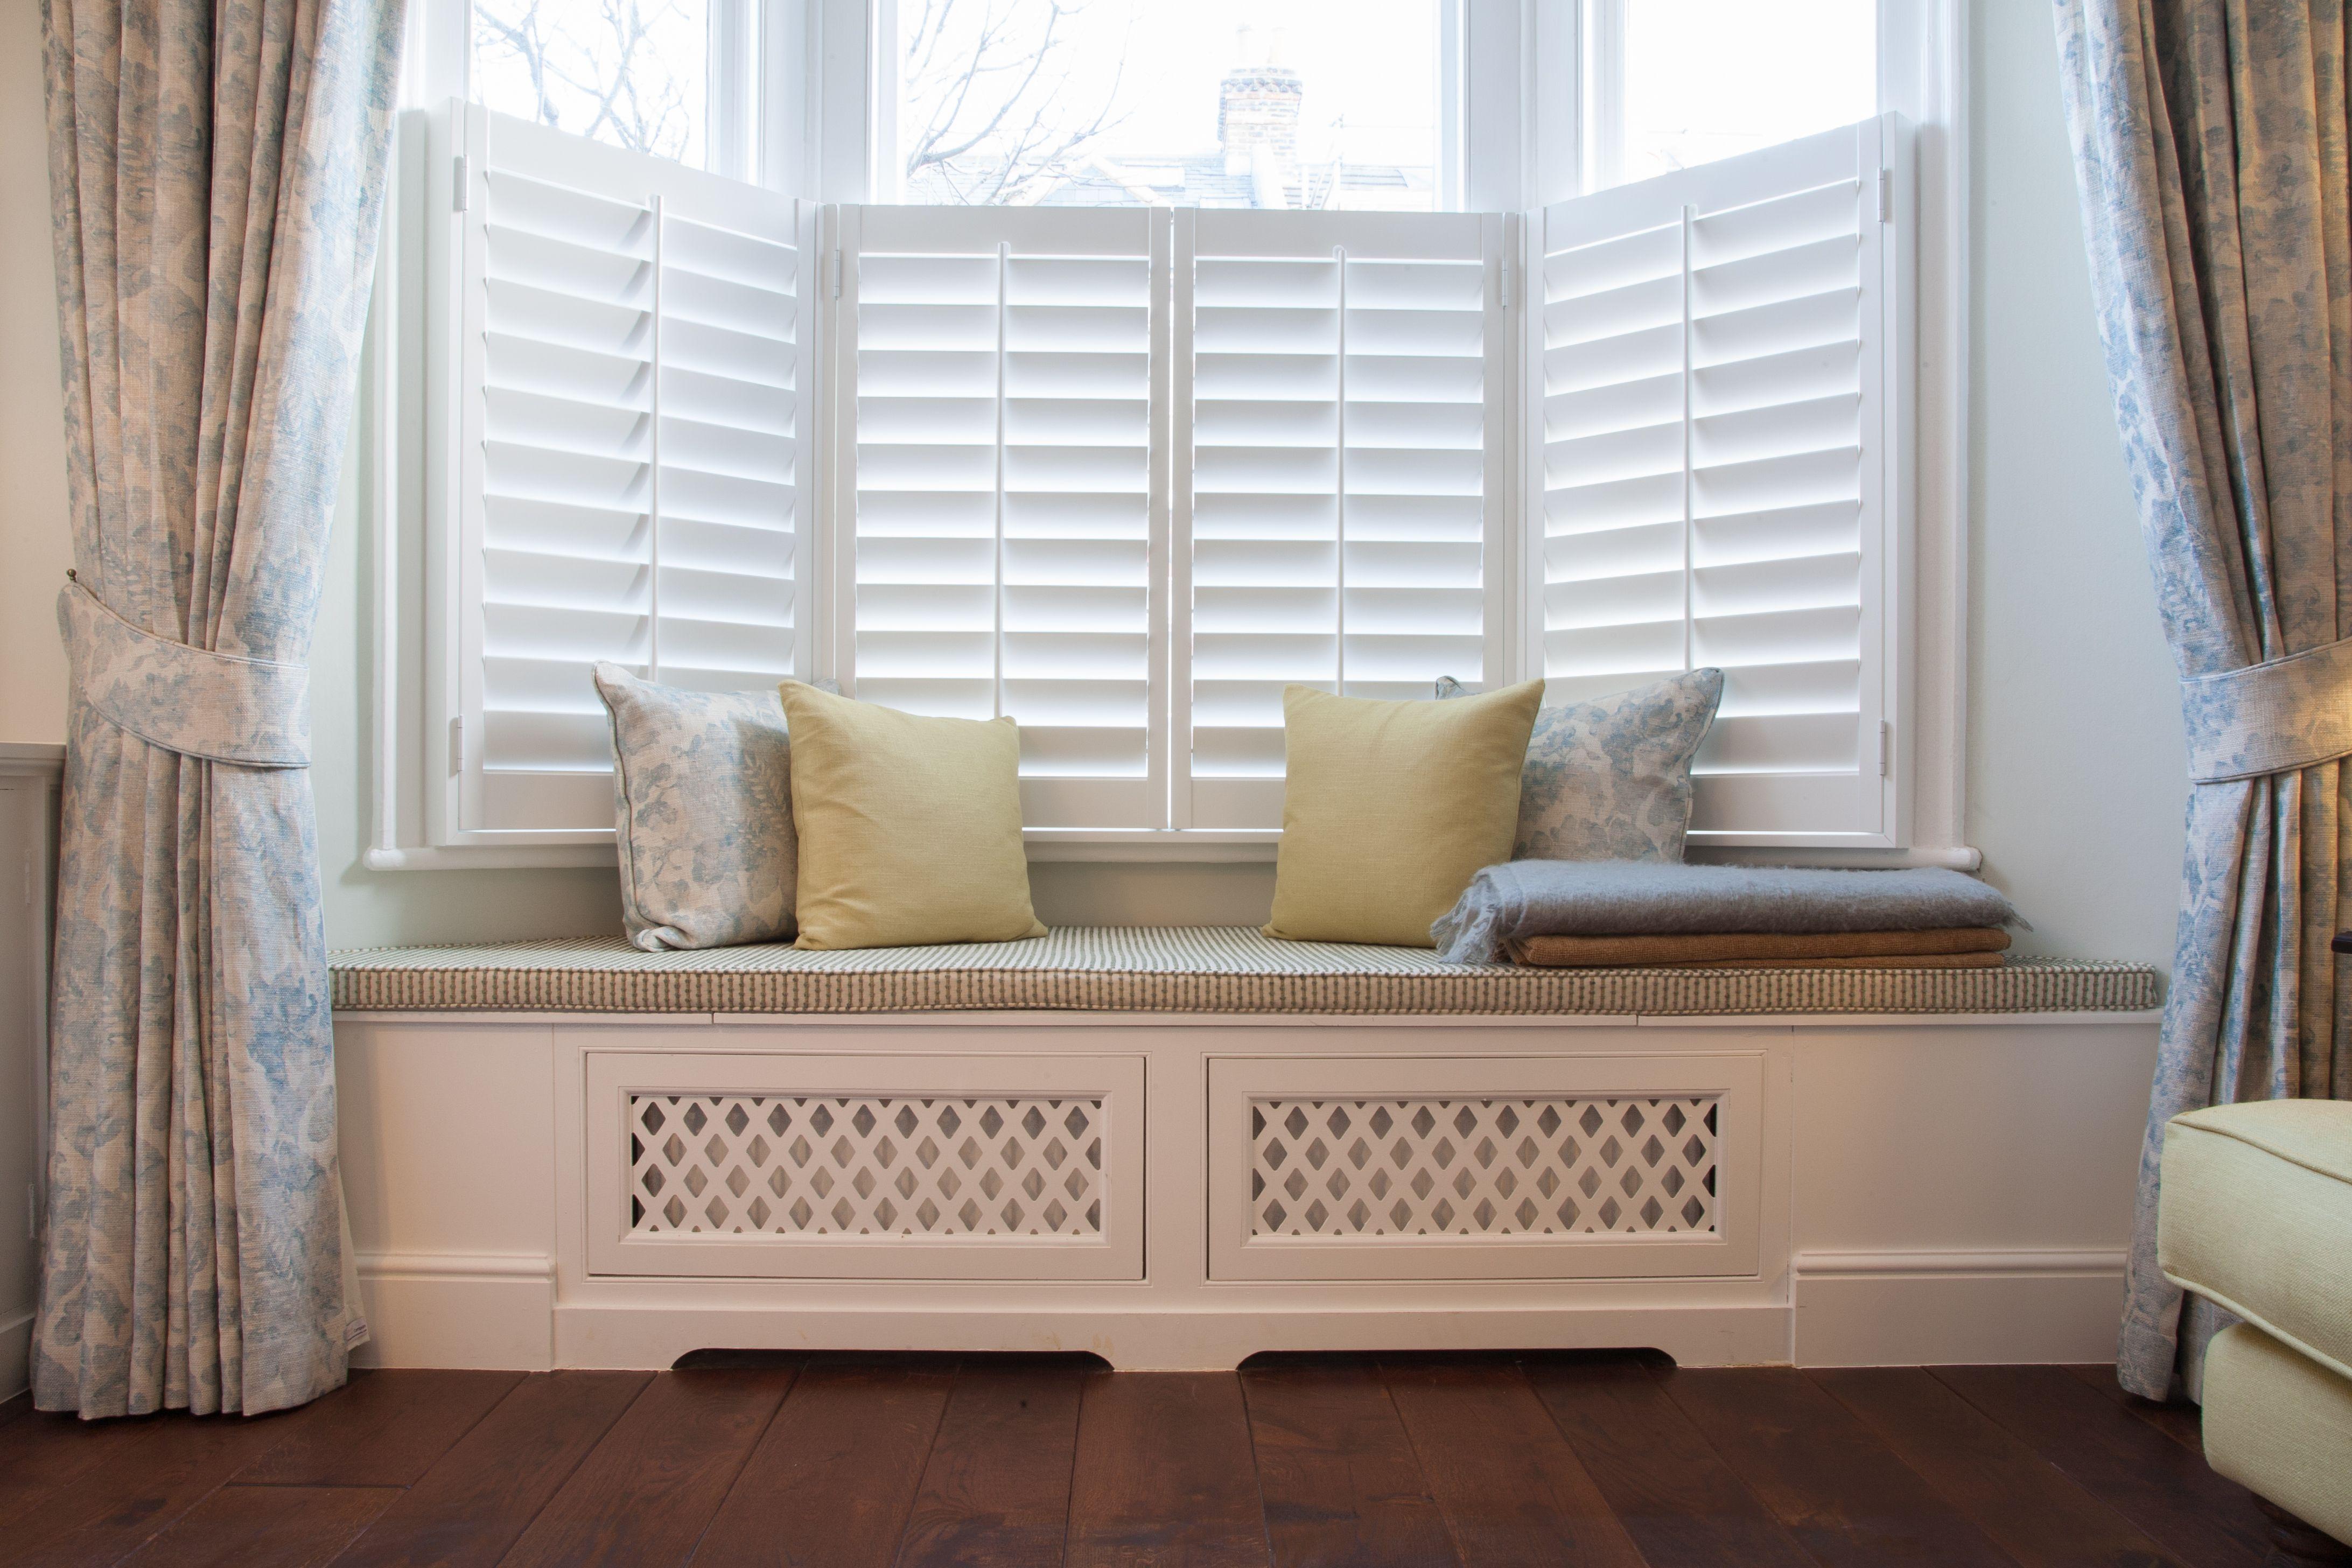 Bespoke window seat with fabrics by Kravet